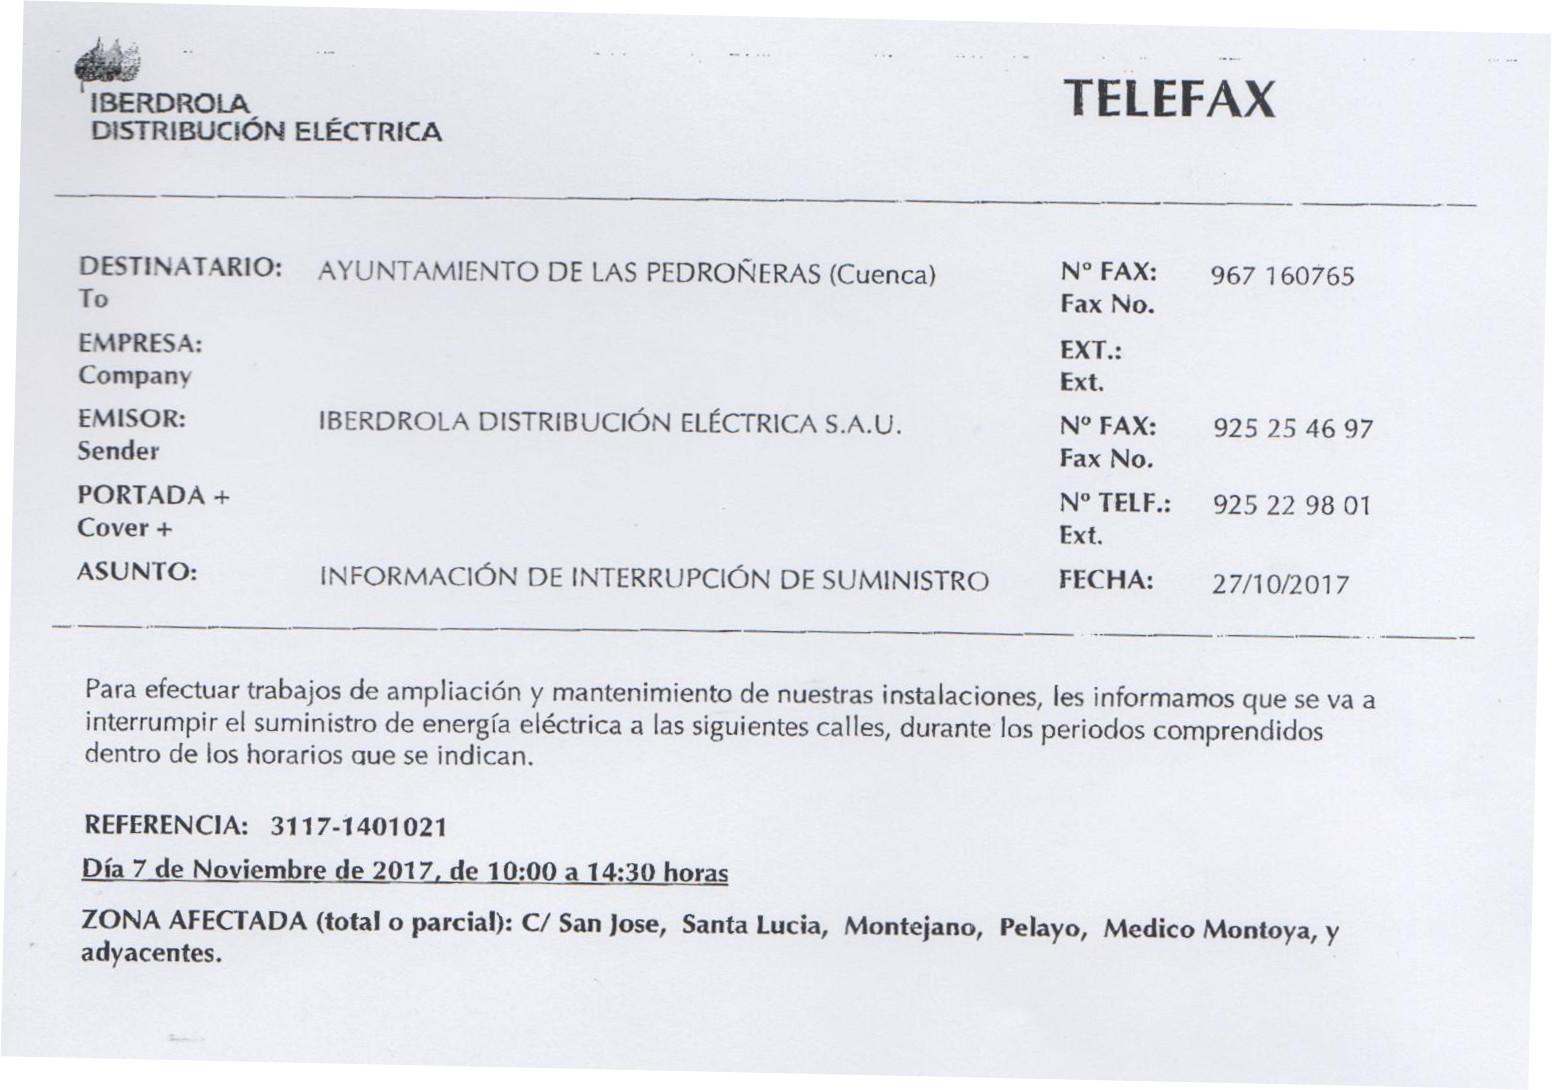 Informaci n corte de suministro 7 de noviembre 2017 for Iberdrola horario oficinas